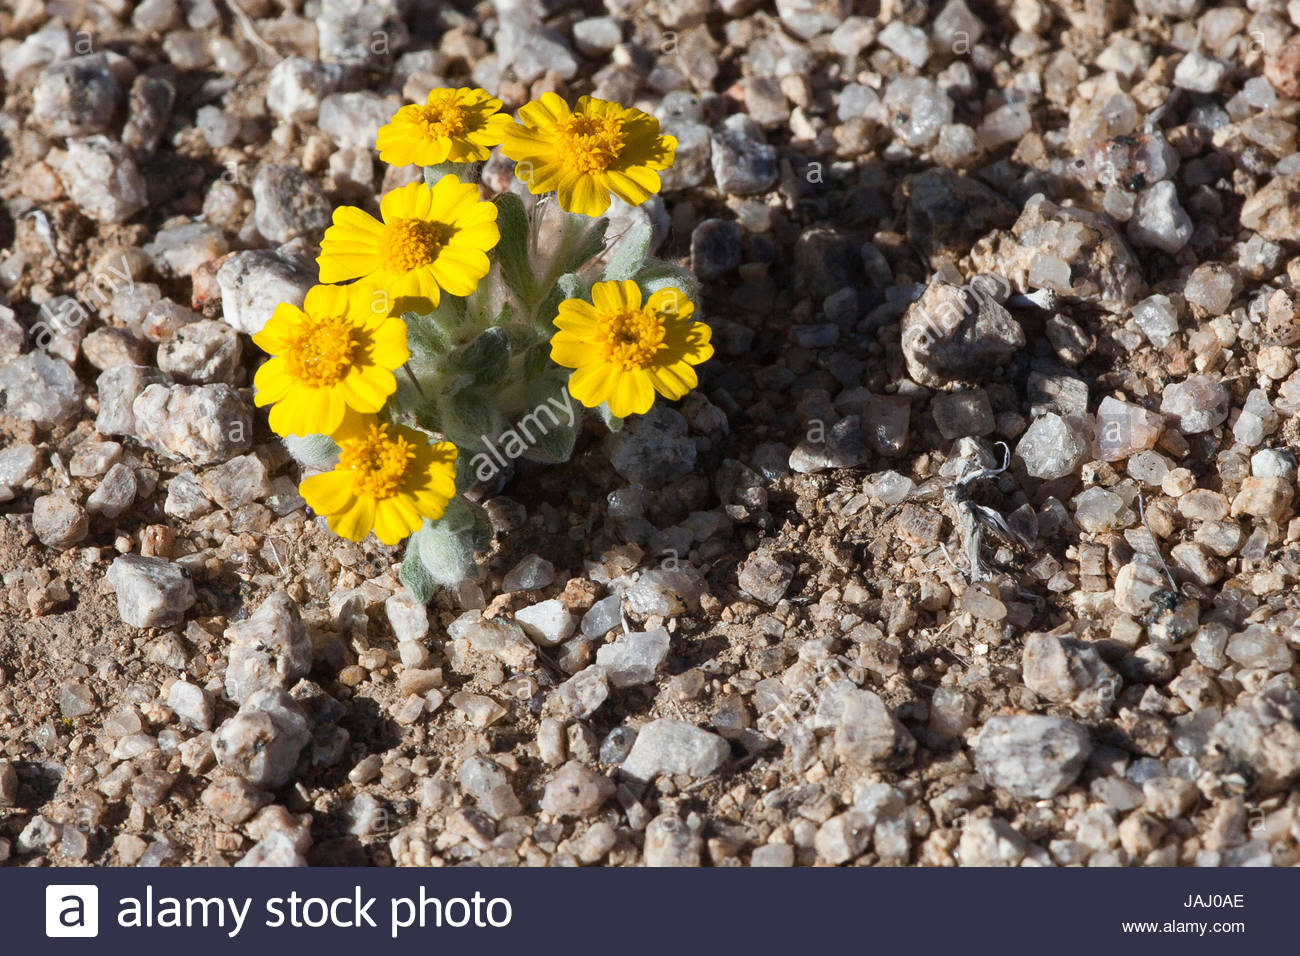 California goldfields, Lasthenia californica, blooming amid pebbles in Joshua Tree National Park. - Stock Image